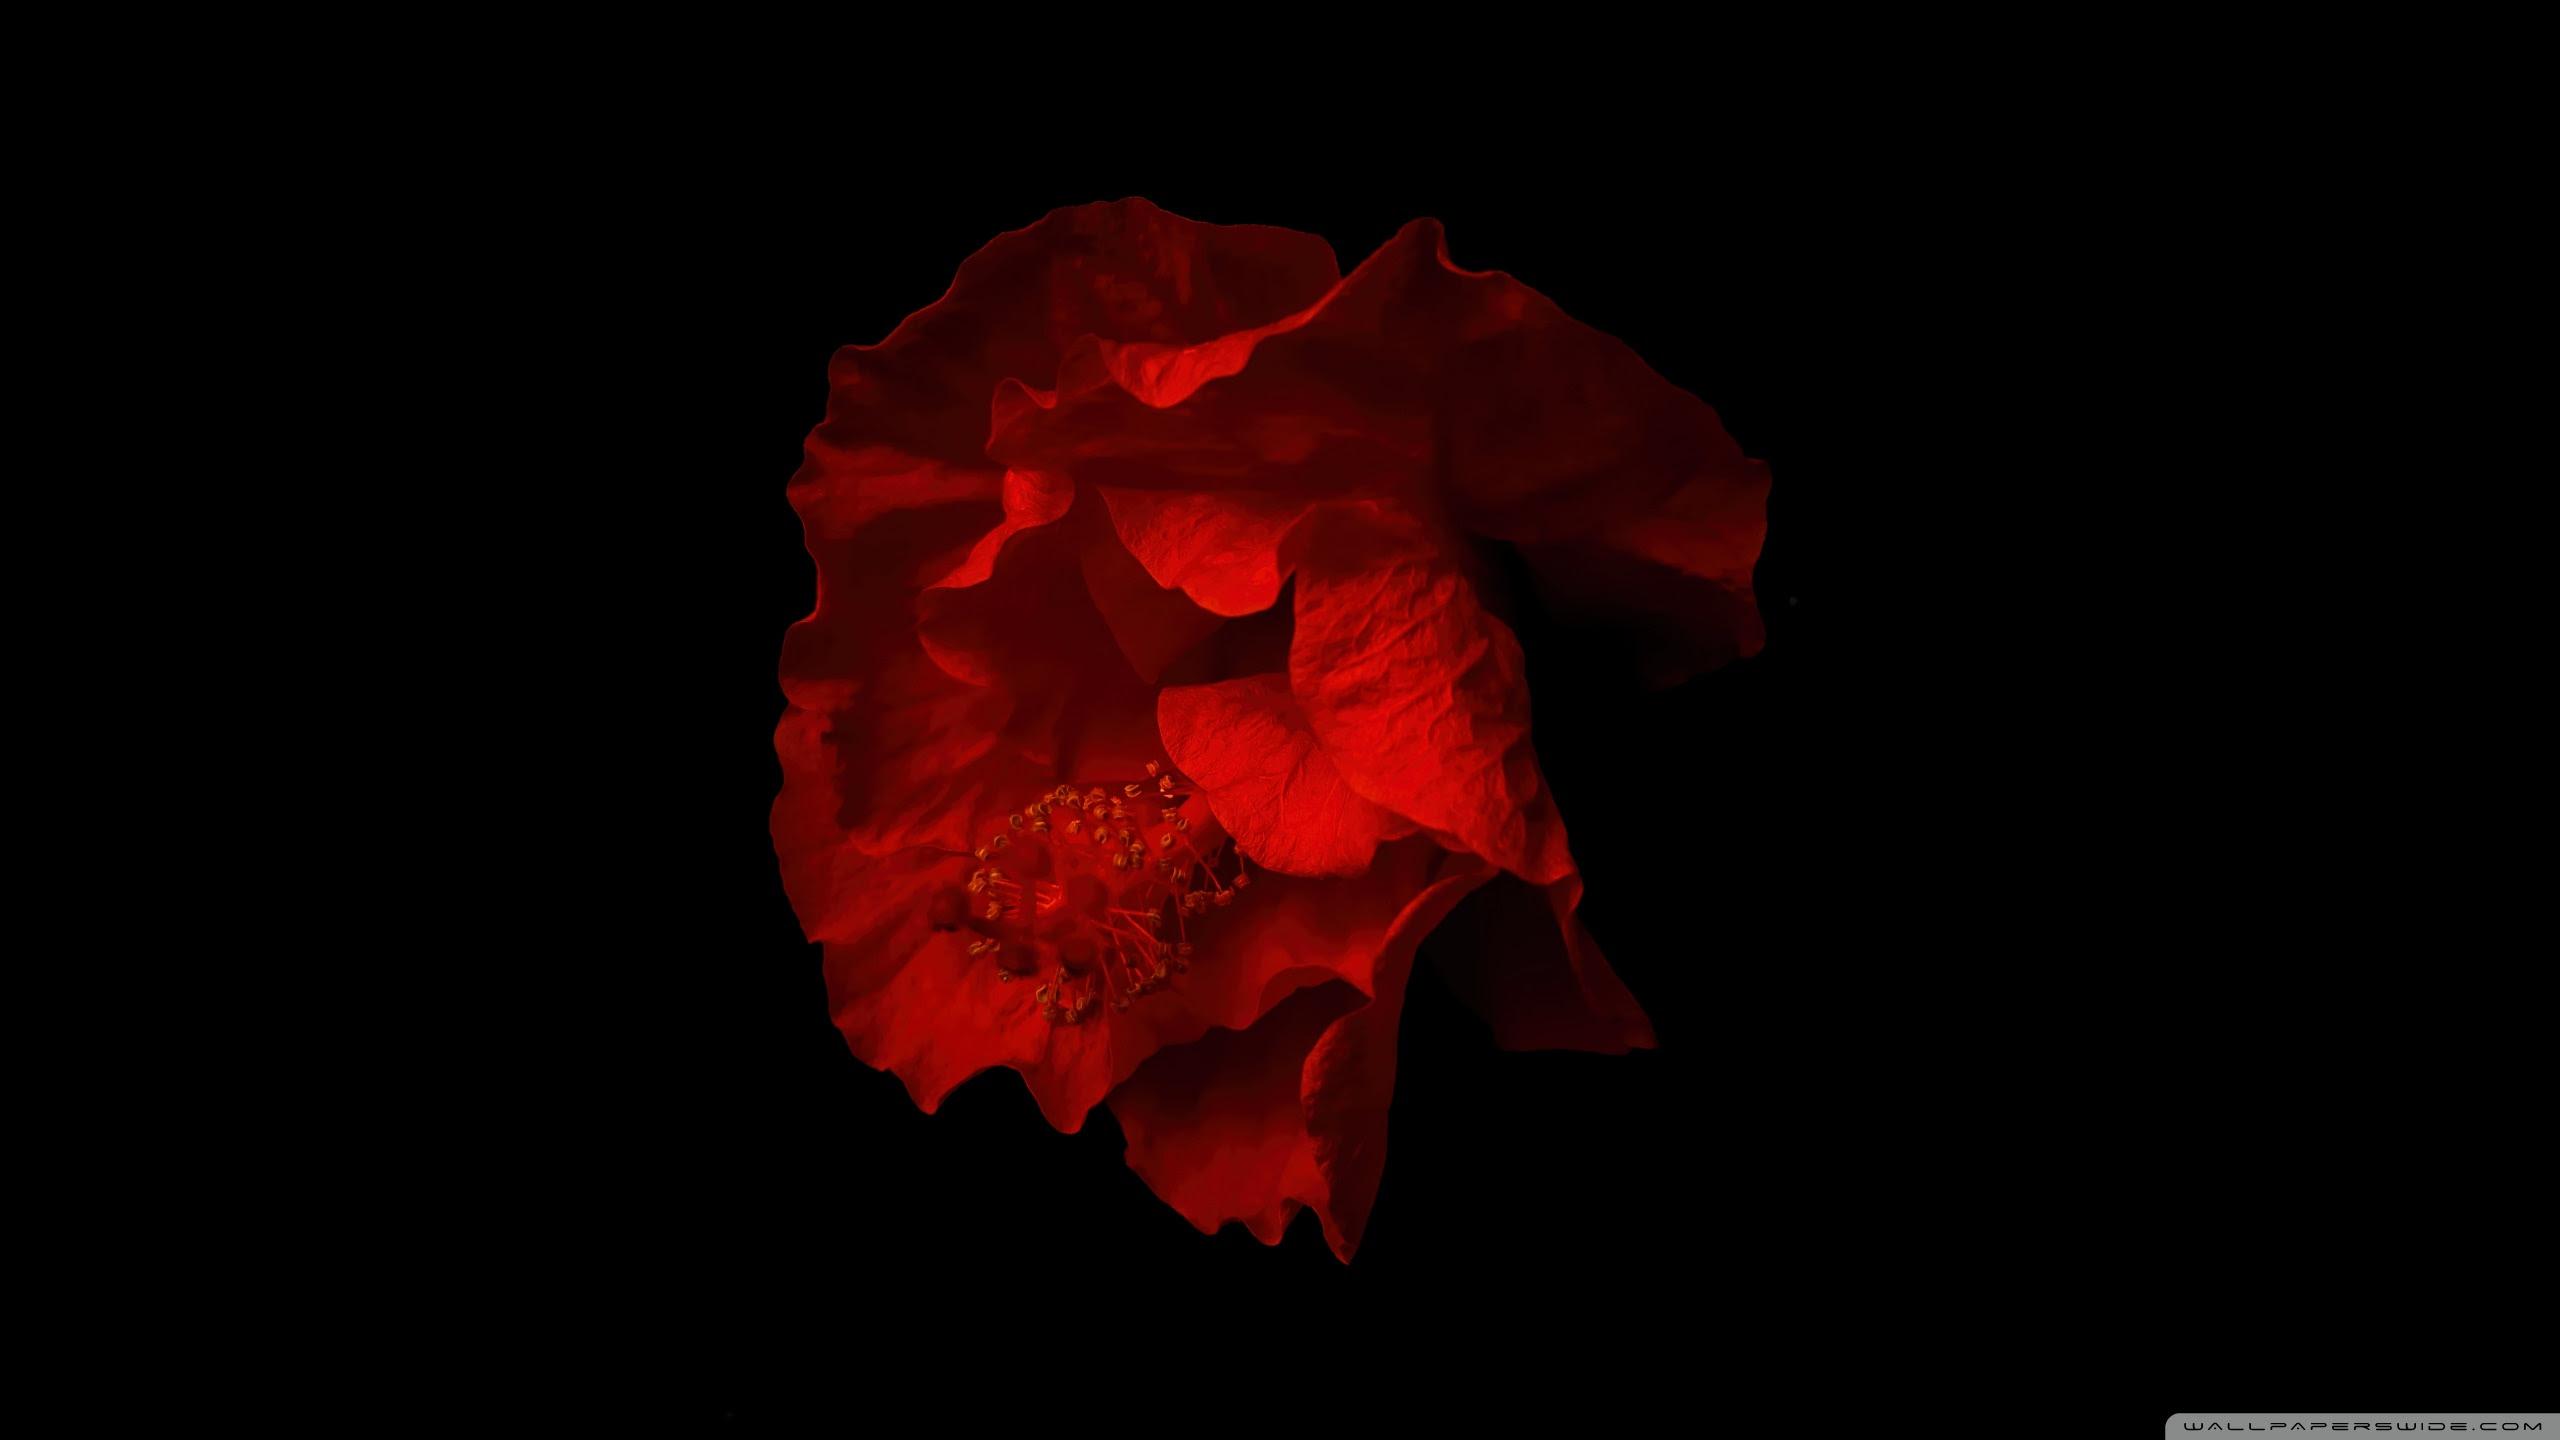 Beautiful Red Hibiscus Flower Black Background Ultra Hd Desktop